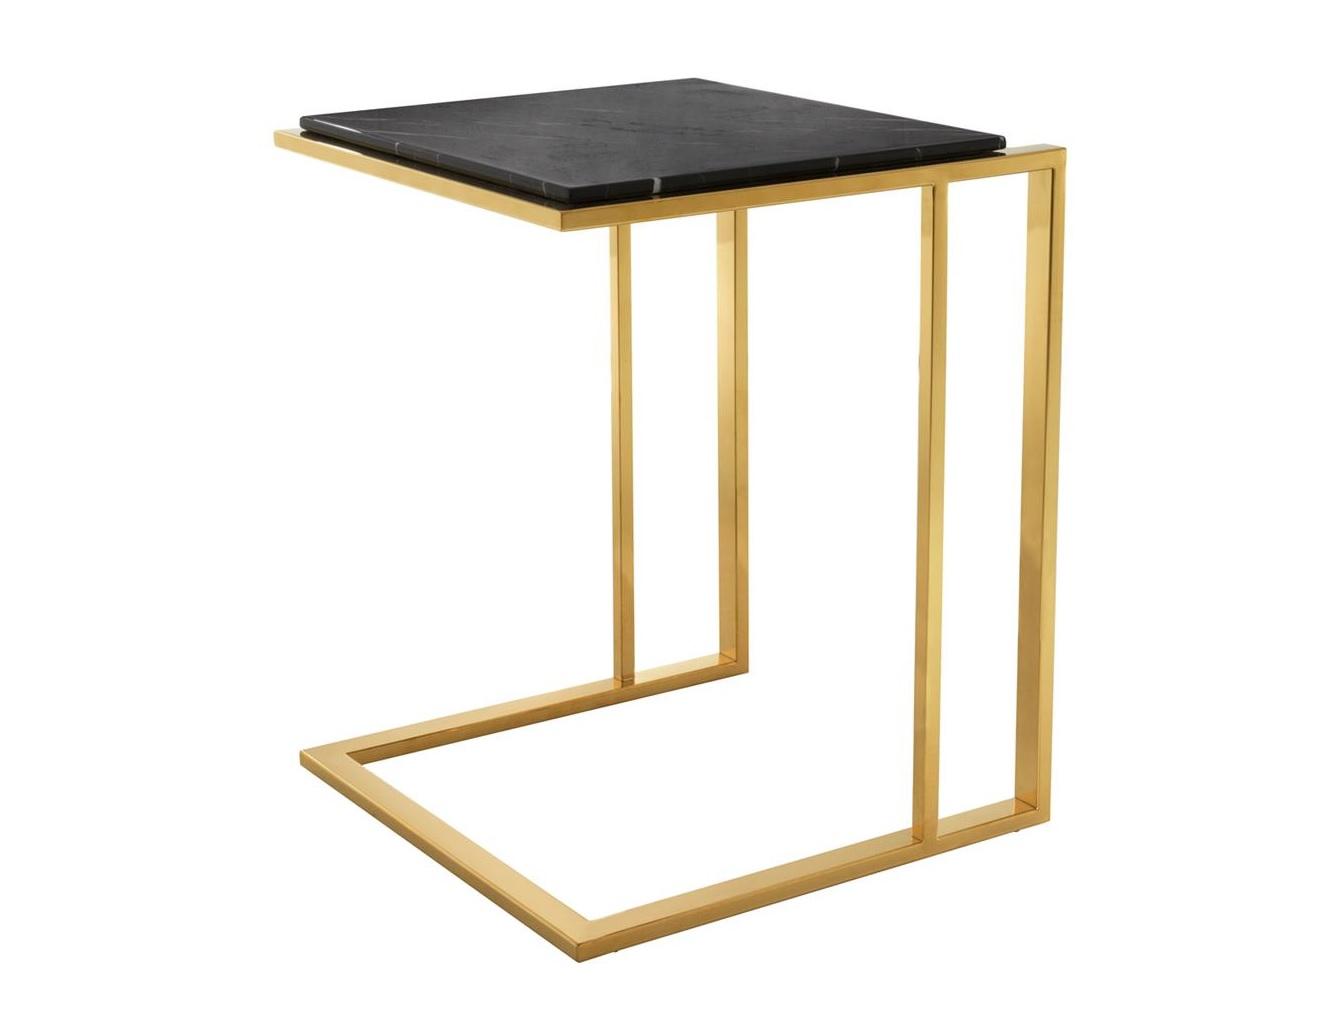 Столик Side Table CocktailПриставные столики<br><br><br>Material: Мрамор<br>Ширина см: 45<br>Высота см: 58<br>Глубина см: 45